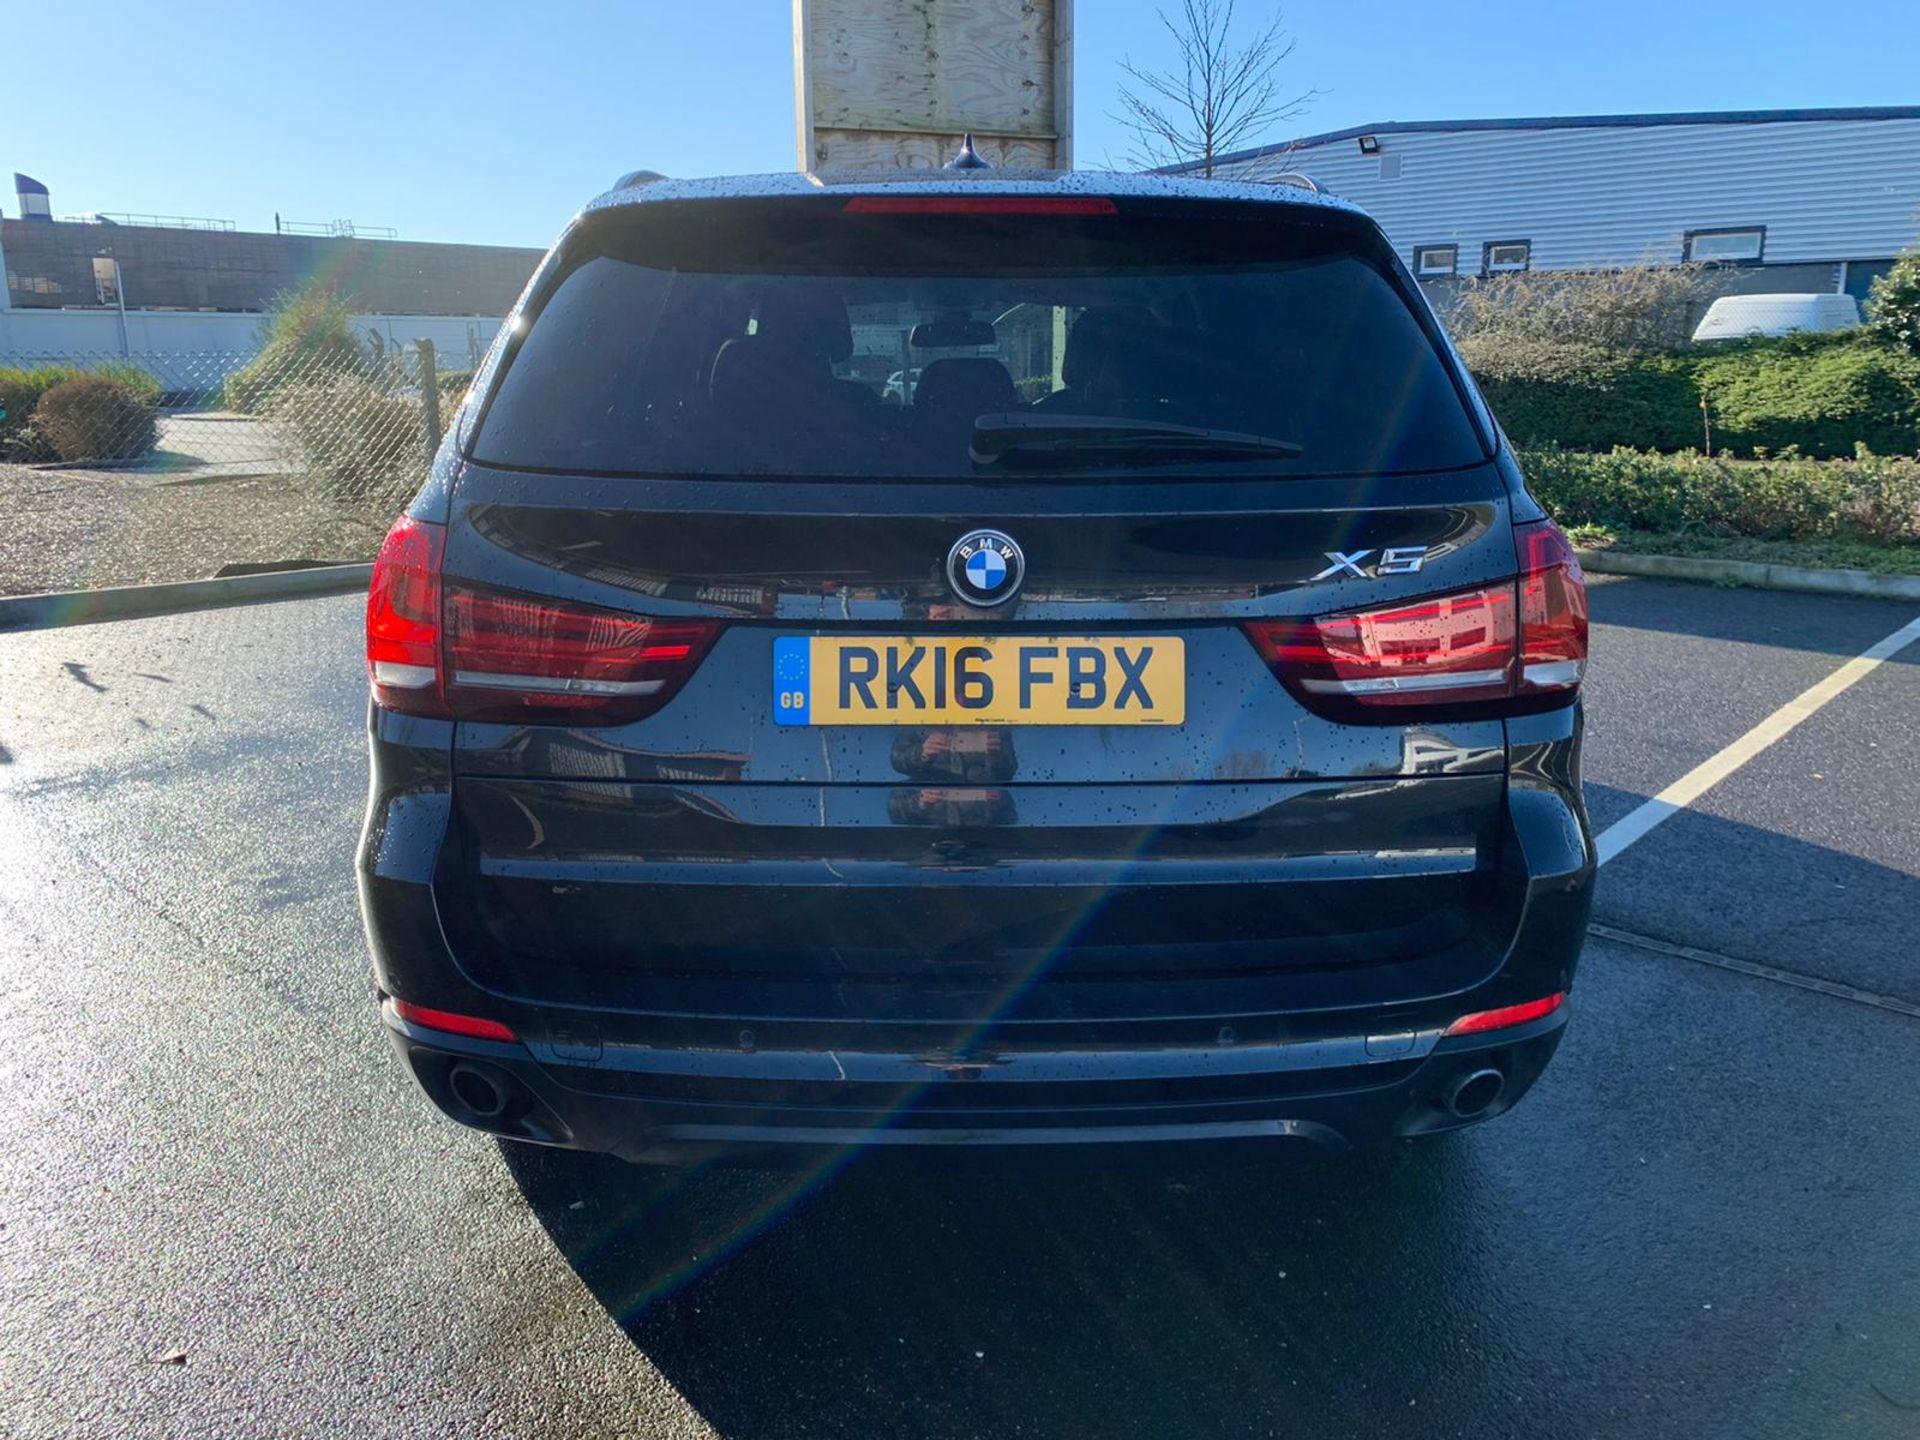 "(Reserve Met) BMW X5 2.0d S-DRIVE ""Special Equipment"" Auto- 7 Seater -16 Reg - Sat Nav- (New Shape) - Image 3 of 43"